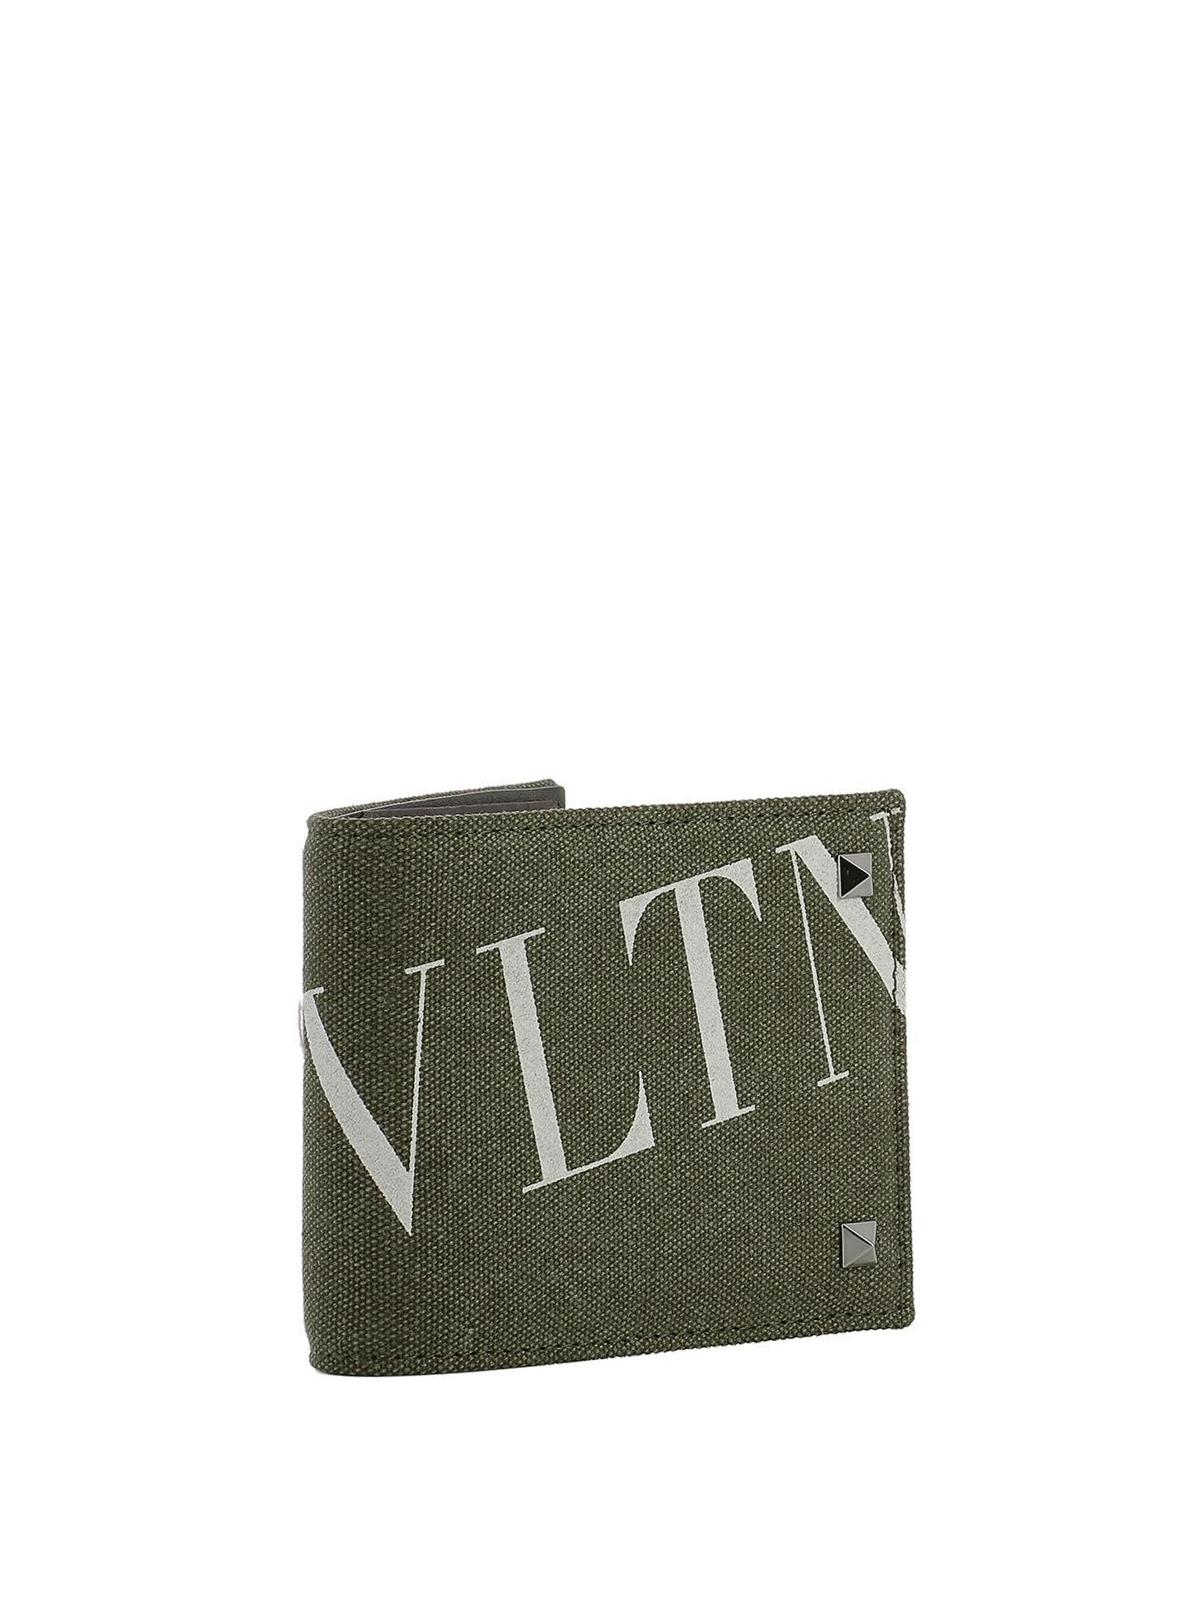 new style 72775 bd0d9 Valentino Garavani - Portafoglio in tessuto VLTN ...